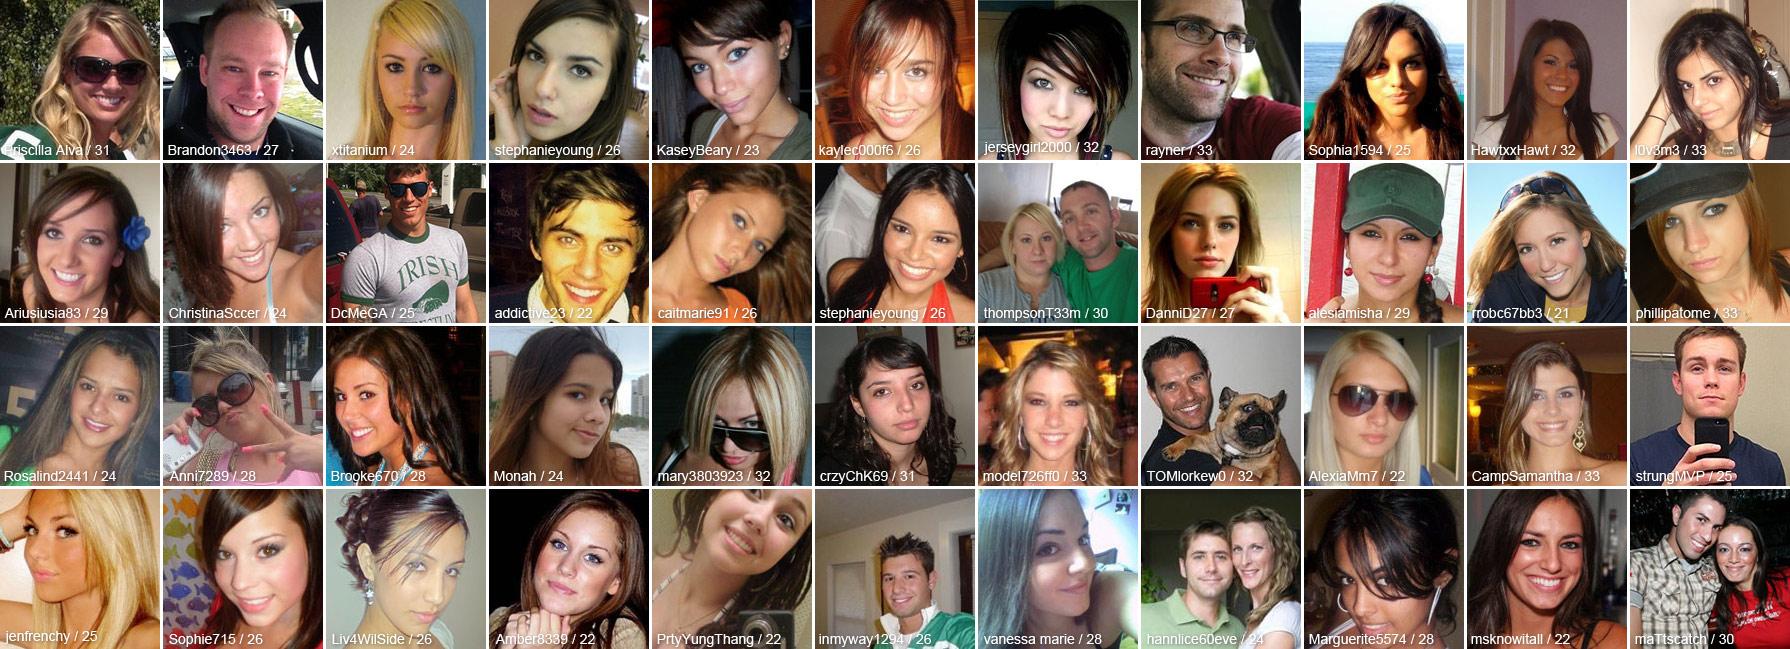 Sext Member Profiles